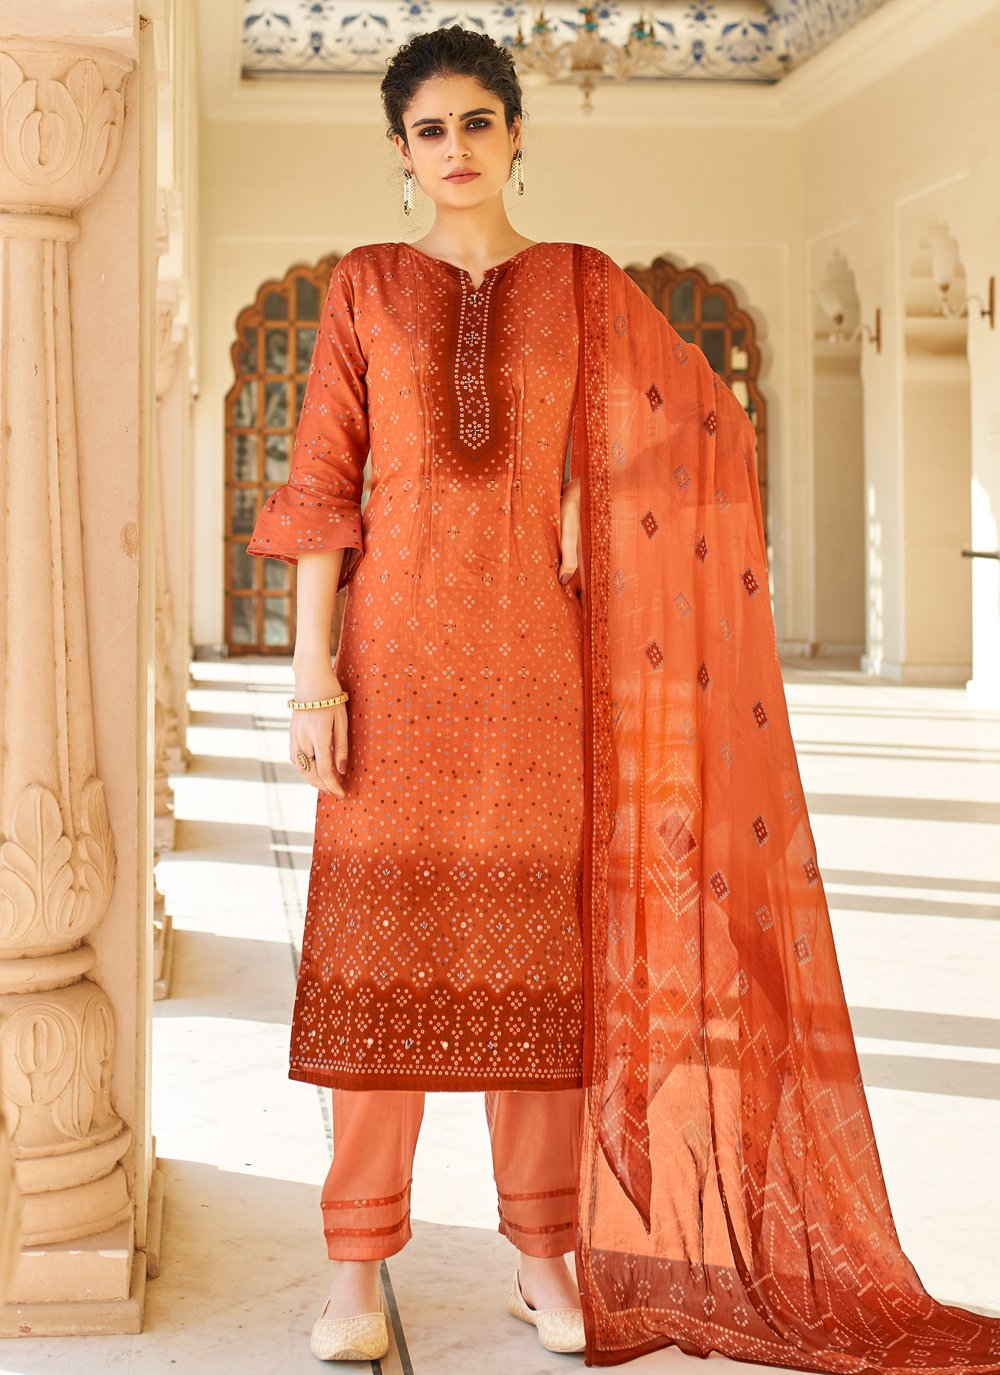 Printed Orange Designer Palazzo Salwar Kameez